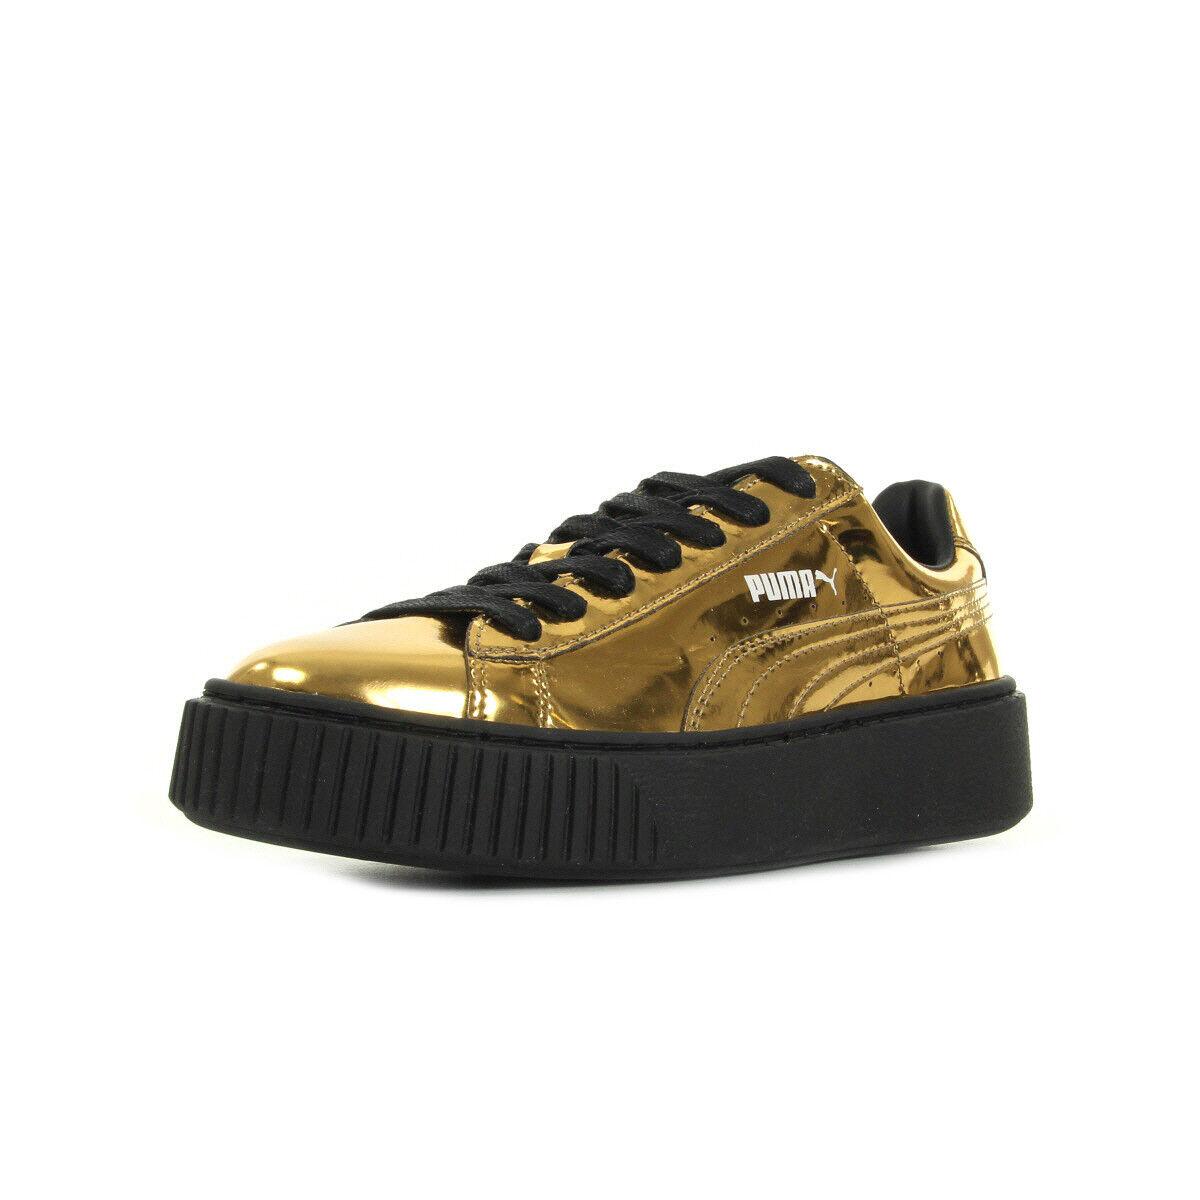 Schuhe Puma Damen Platform Metallic